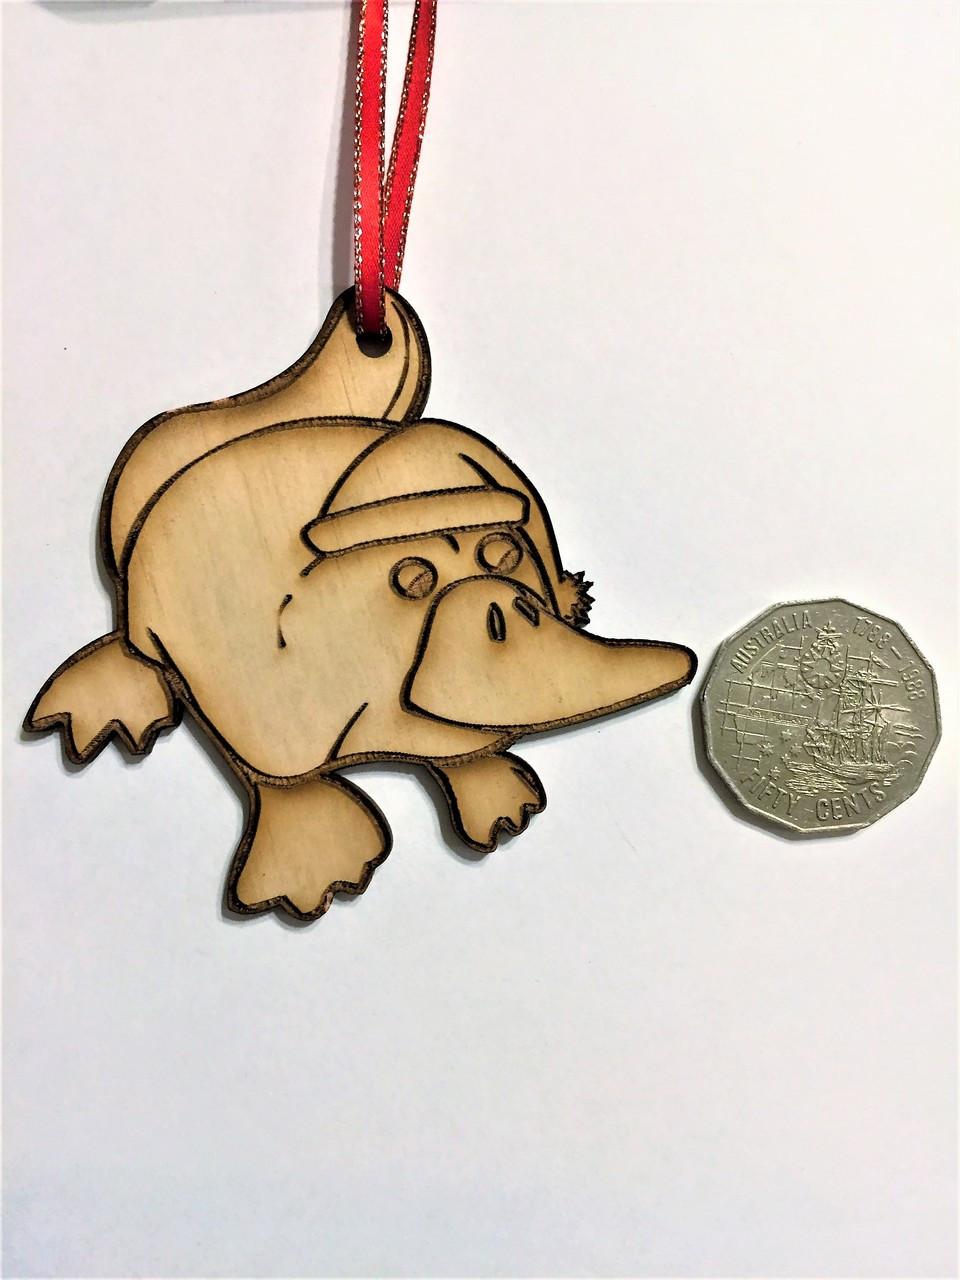 D-Platypus - Wooden Christmas Tree Ornament